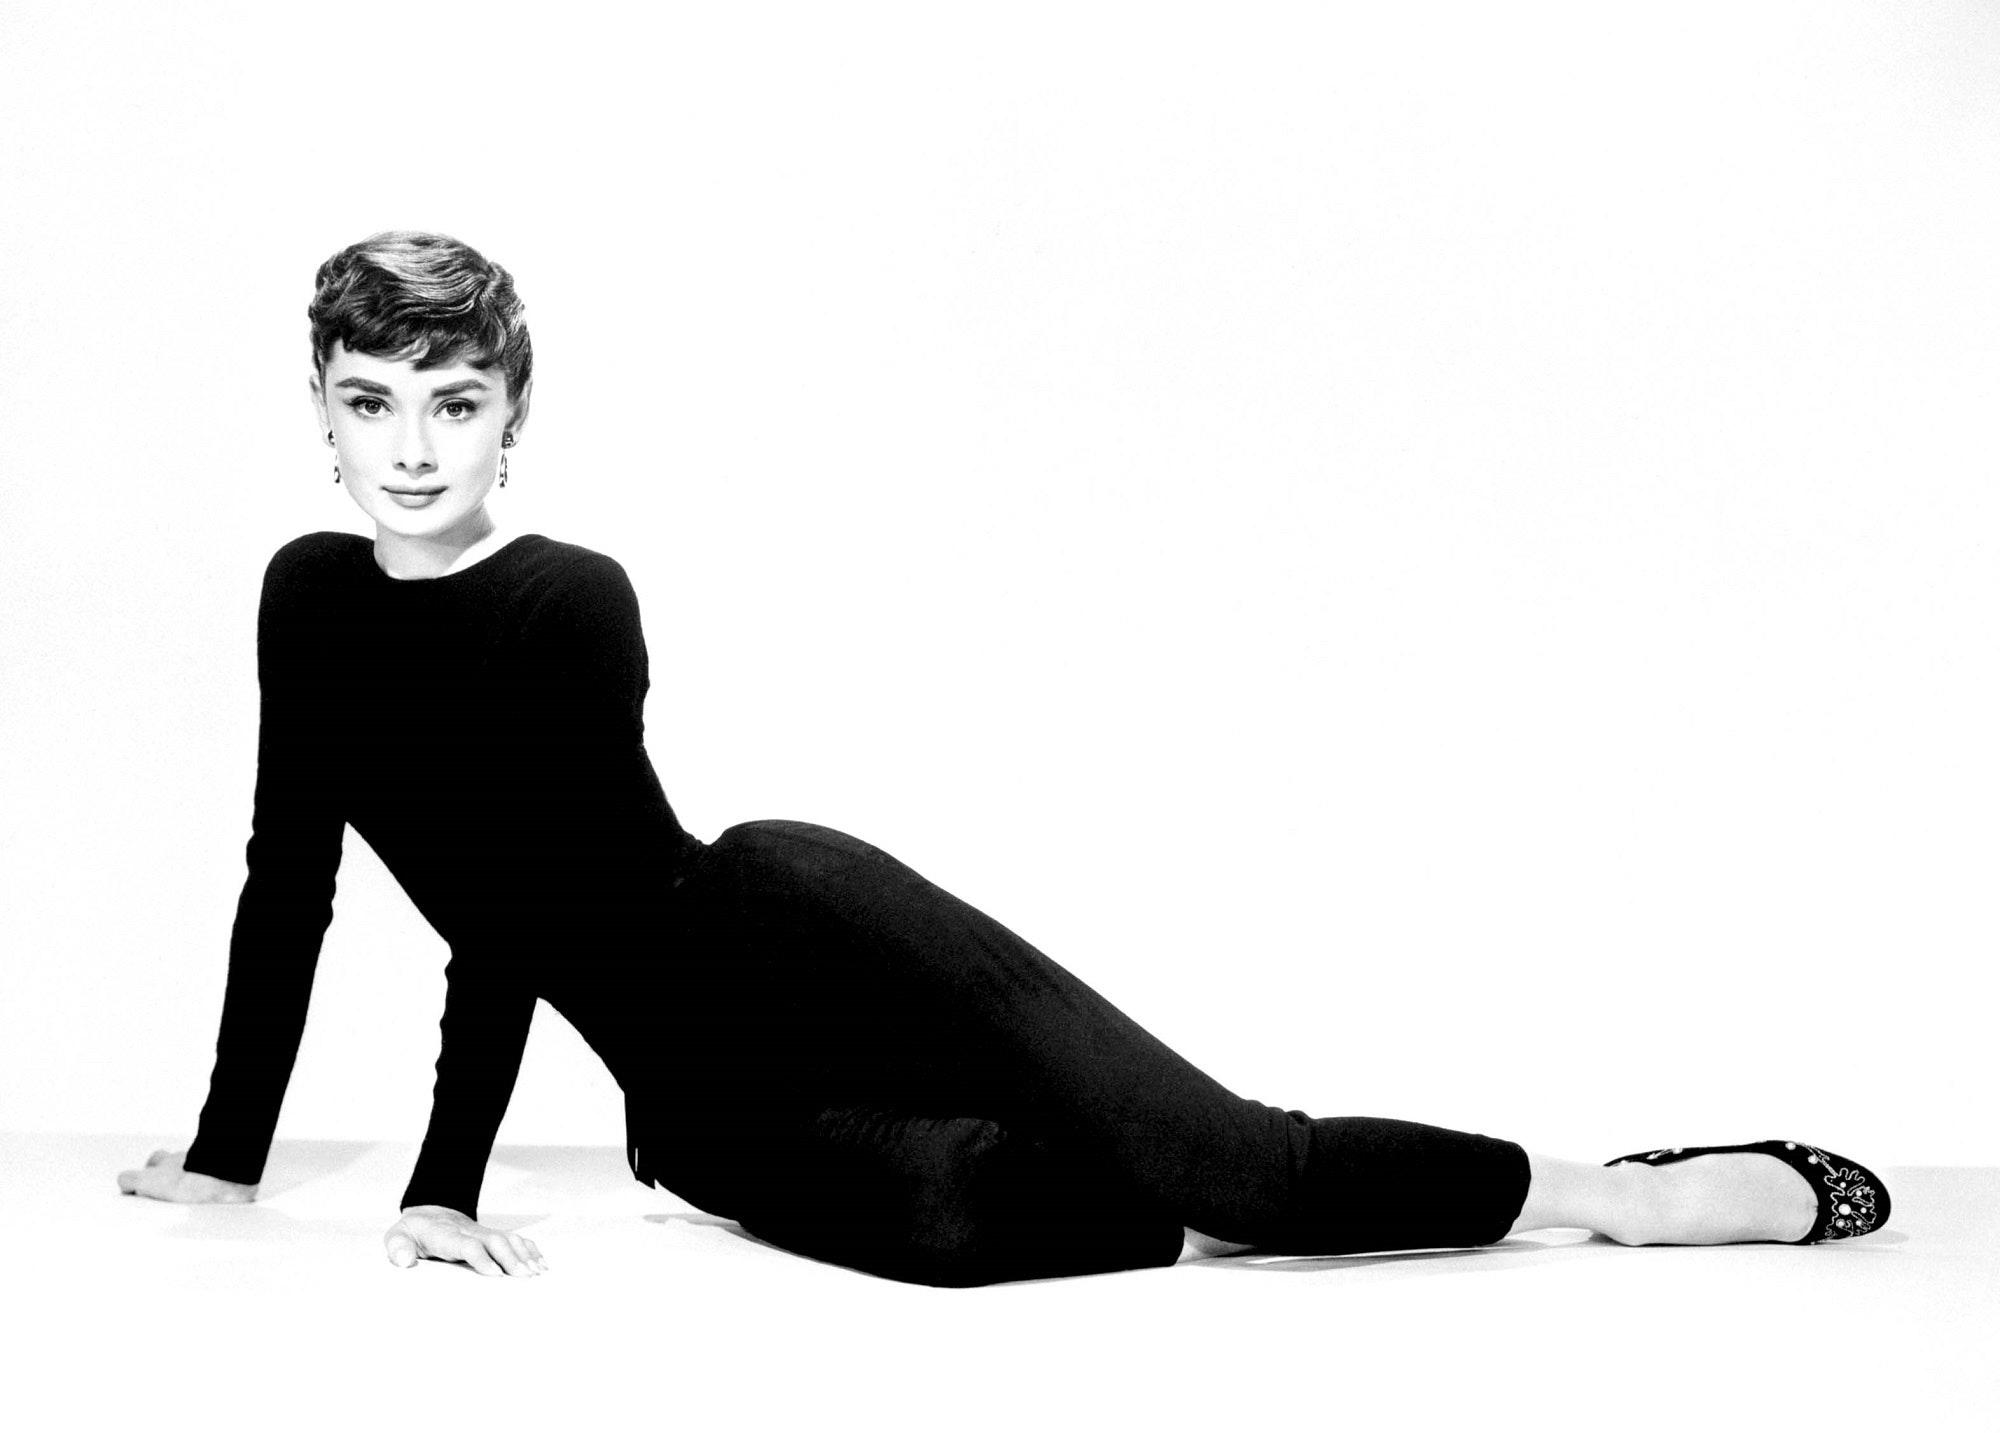 Free Stock Photo Of Actress Audrey Hepburn Black And White